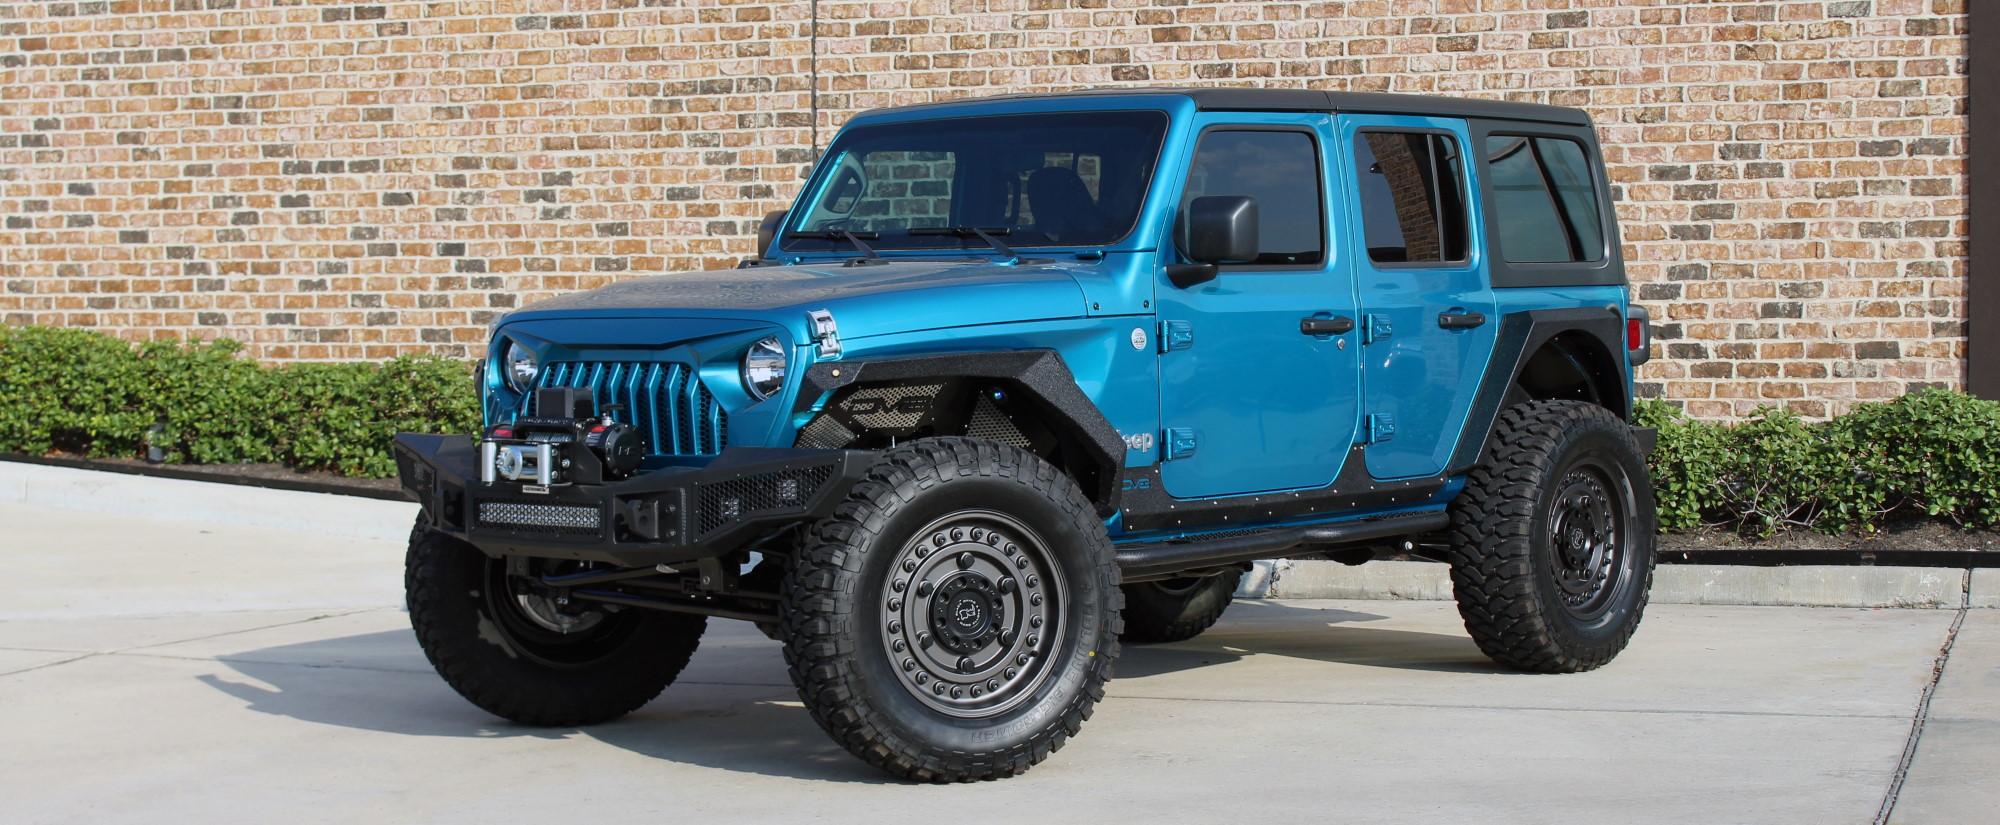 2019 jeep wrangler unlimited jl blue